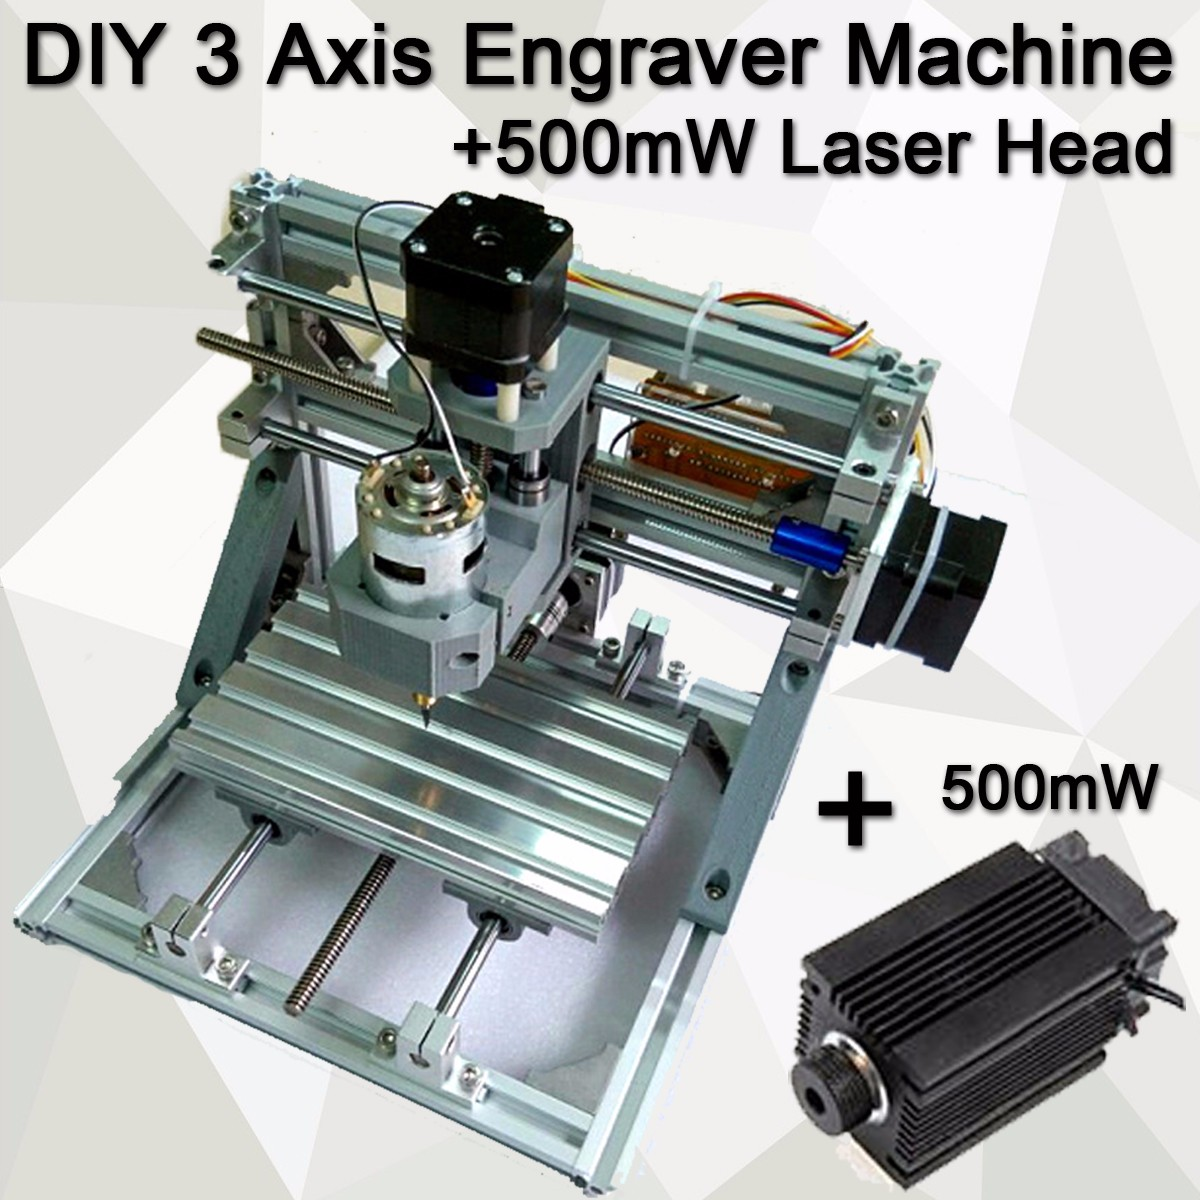 Mini 3 grabador láser máquina cc 12V DIY cortador de madera de escritorio/impresora/potencia ajustable con cabezal láser de 500MW